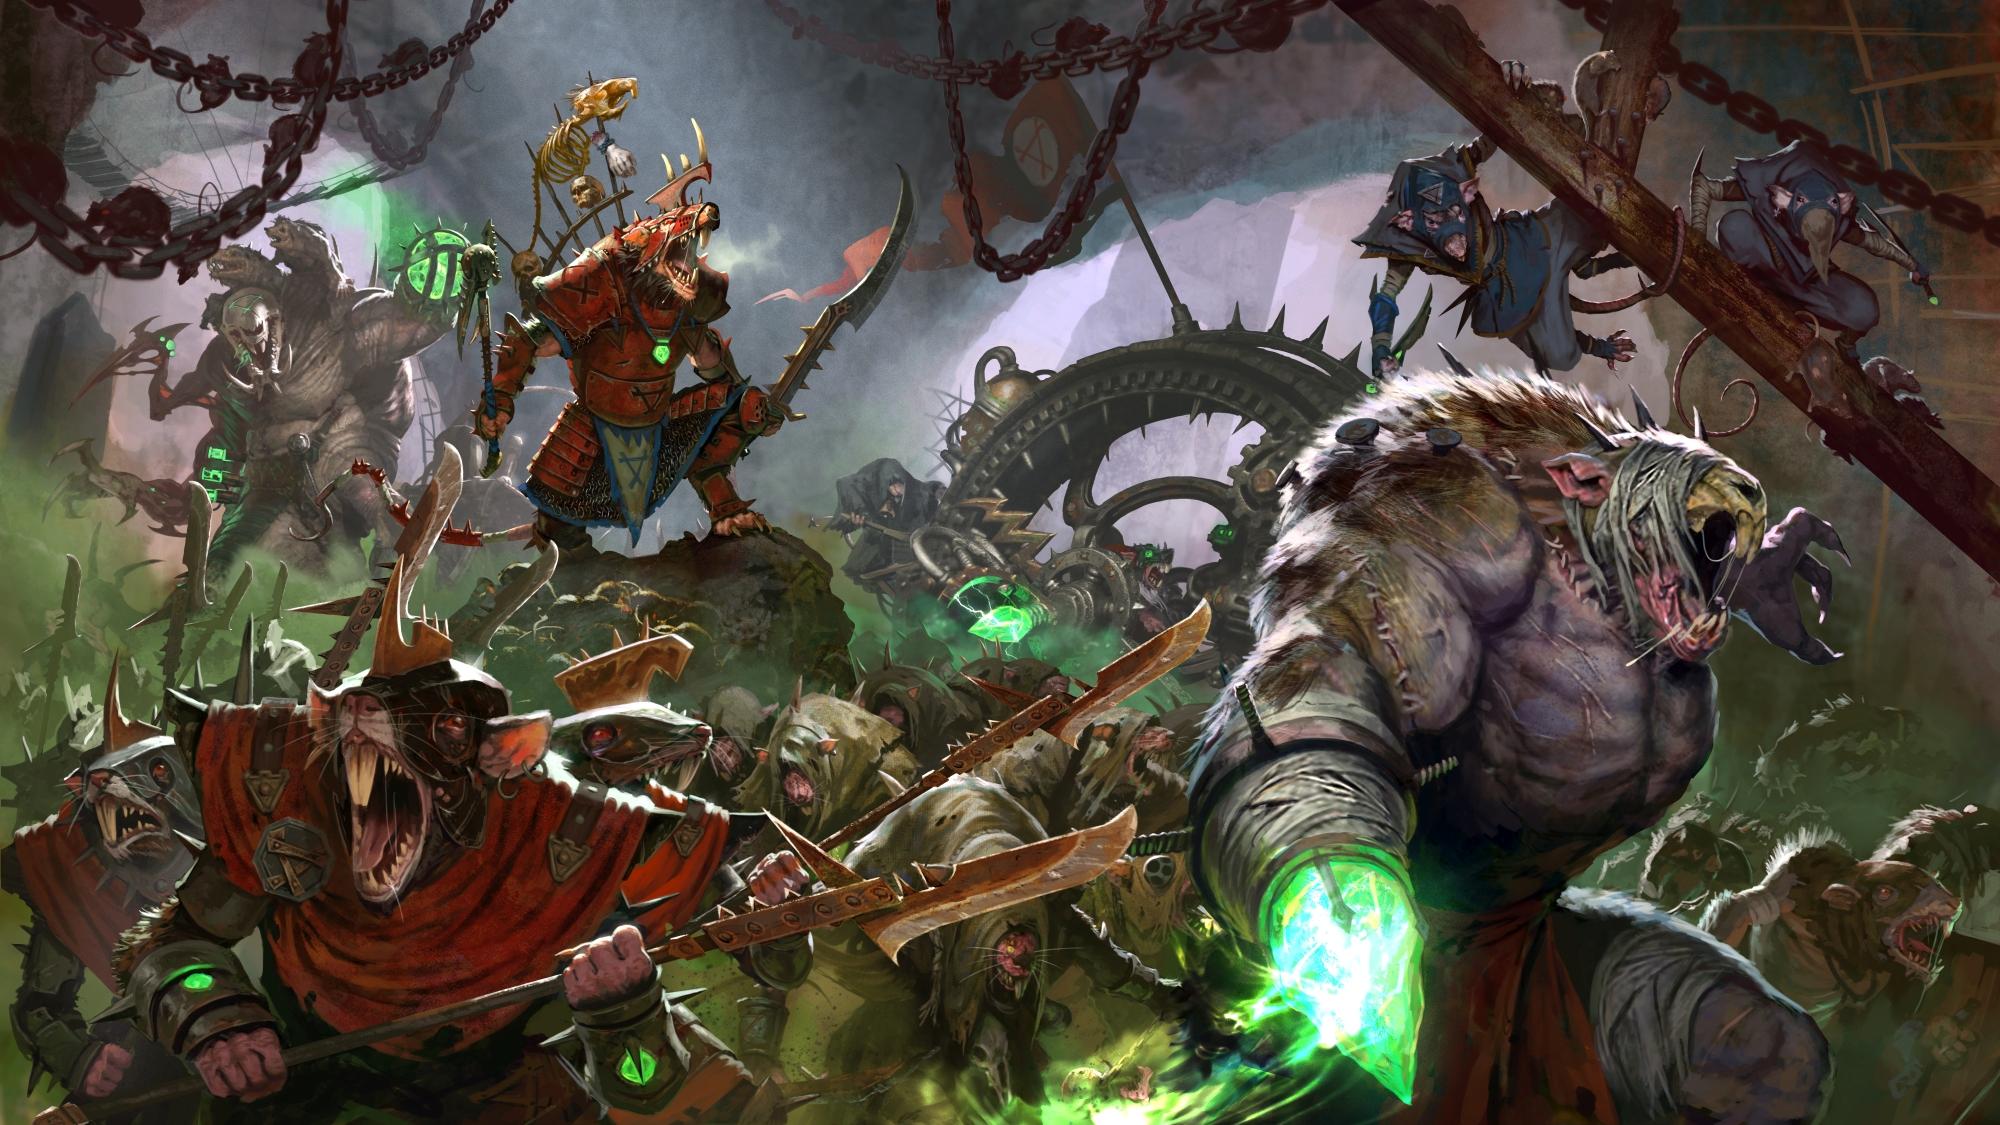 Total-War-Warhammer-2-Skaven-Reveal-01-Skaven-Artwork.jpg